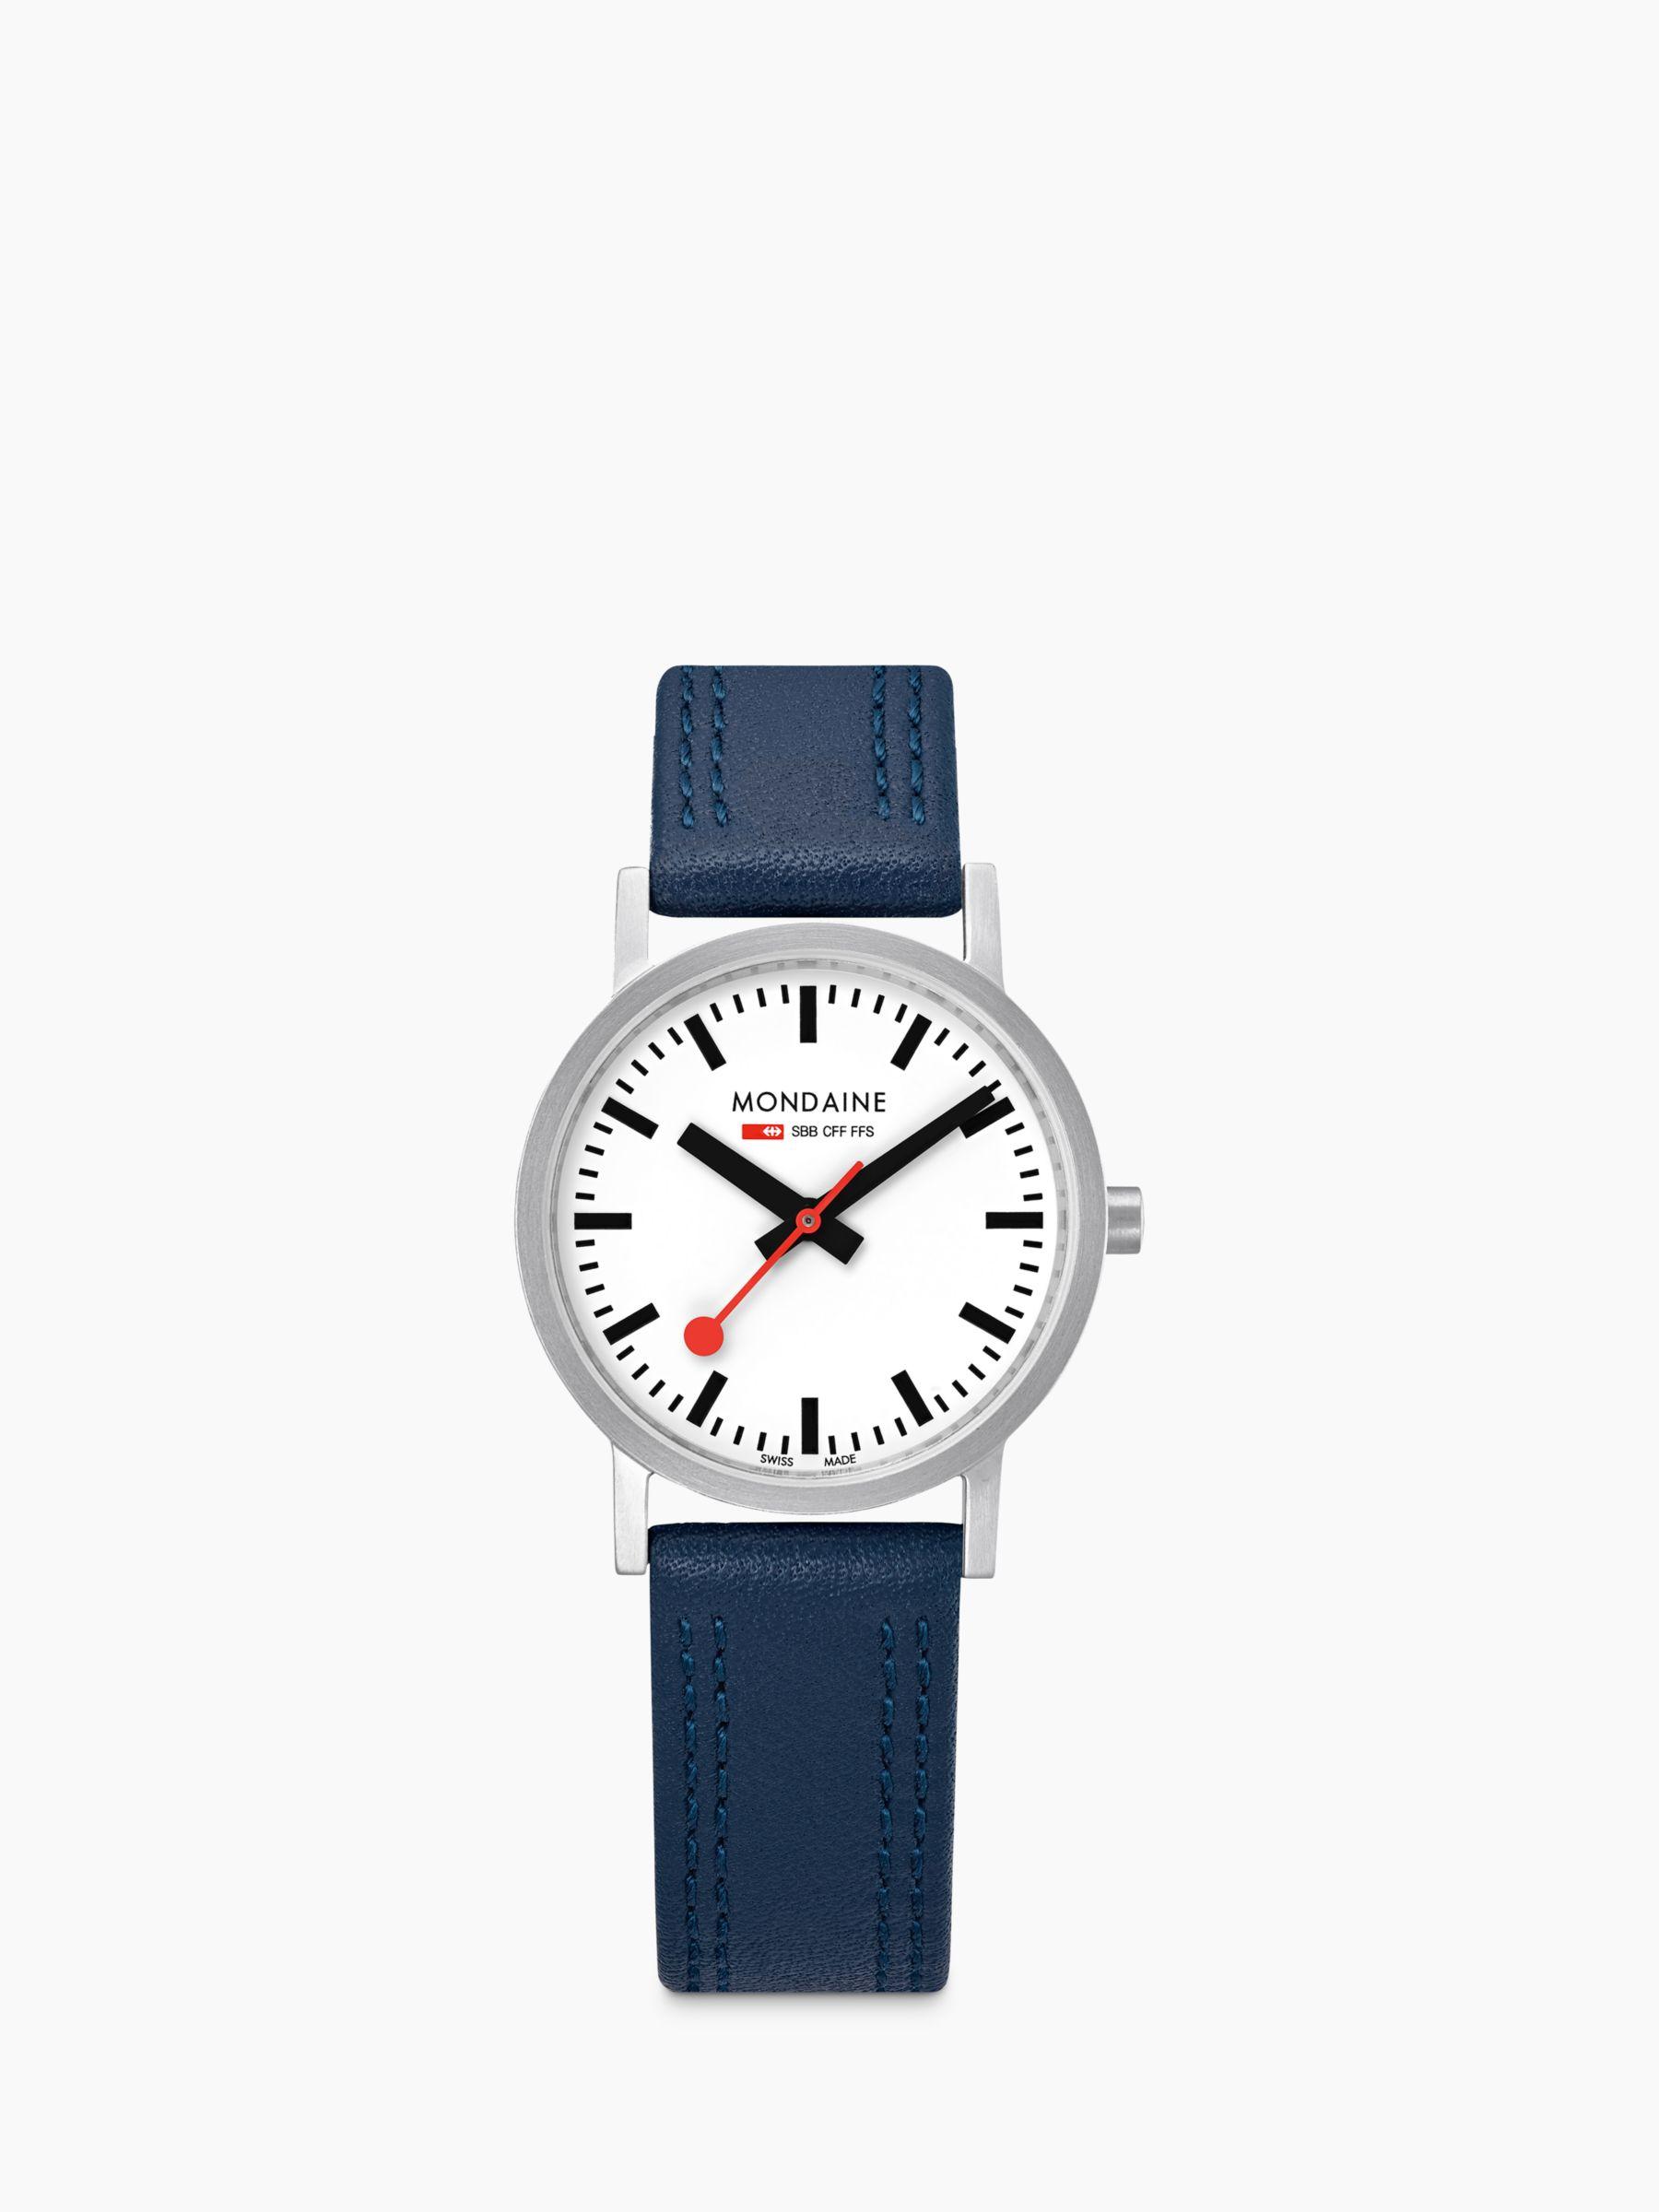 Mondaine Mondaine Unisex SBB Classic Stitch Leather Strap Watch